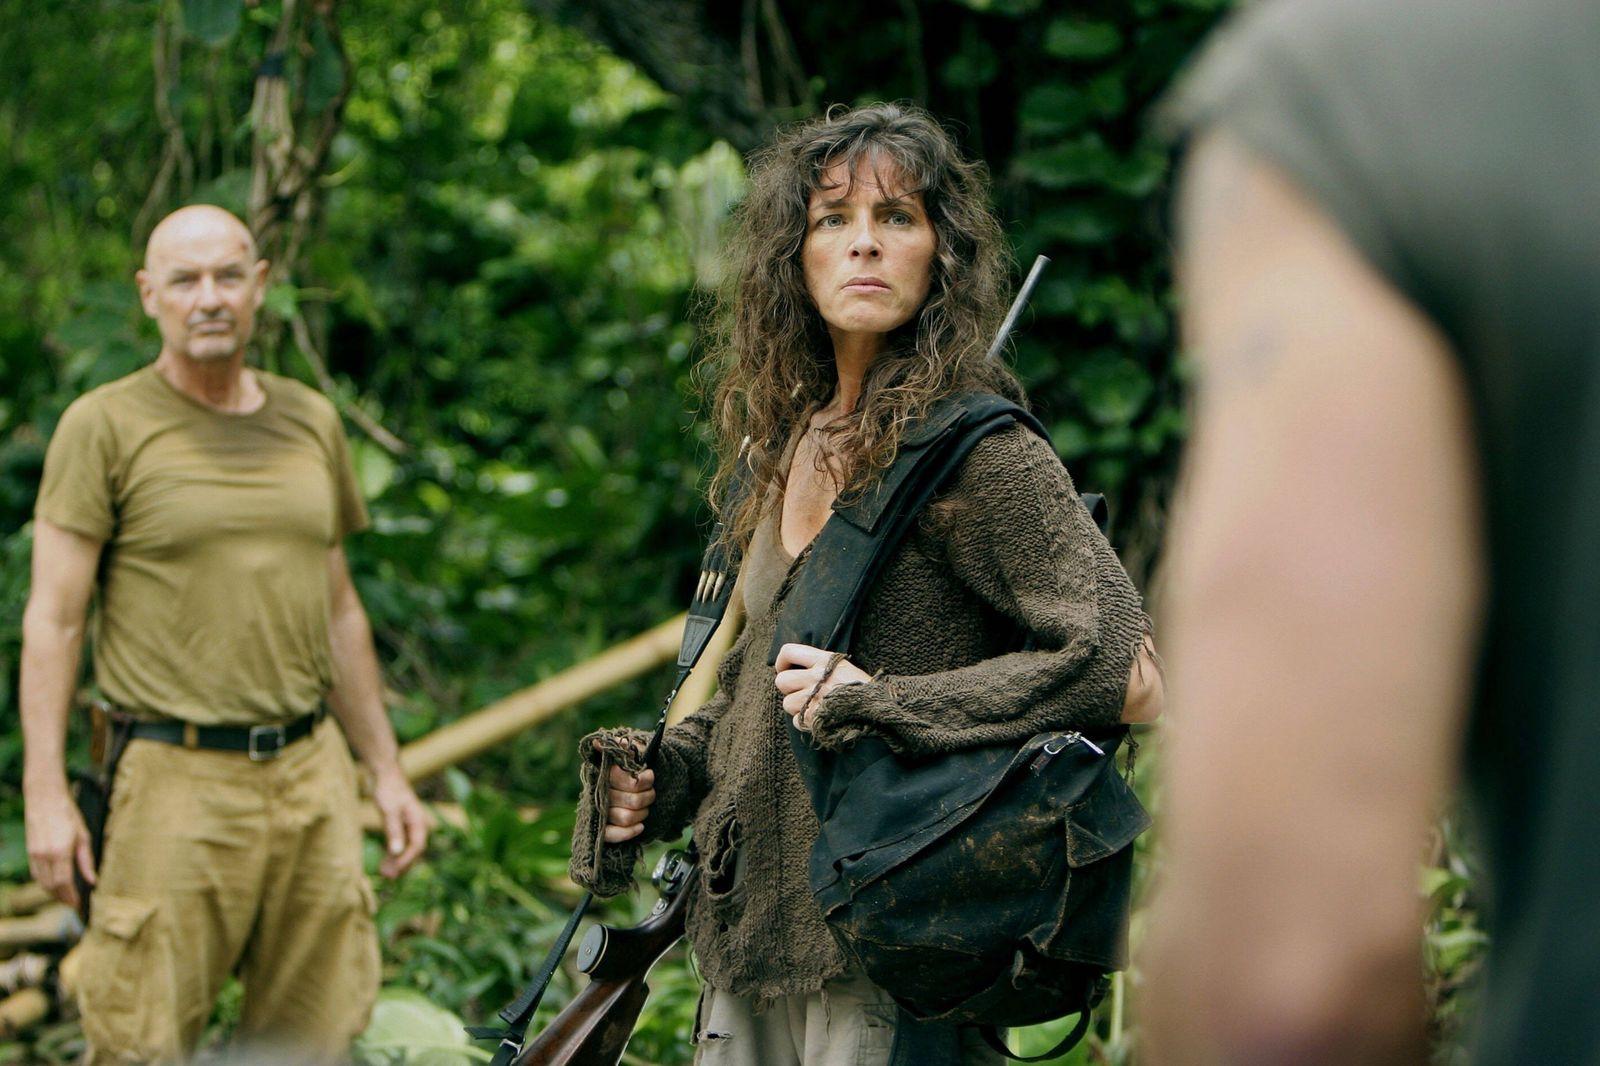 Terry O Quinn & Mira Furlan Television: Lost : Season 1 (TV-SERIE) Usa 2004-2010, 22 September 2004 PUBLICATIONxINxGERxS